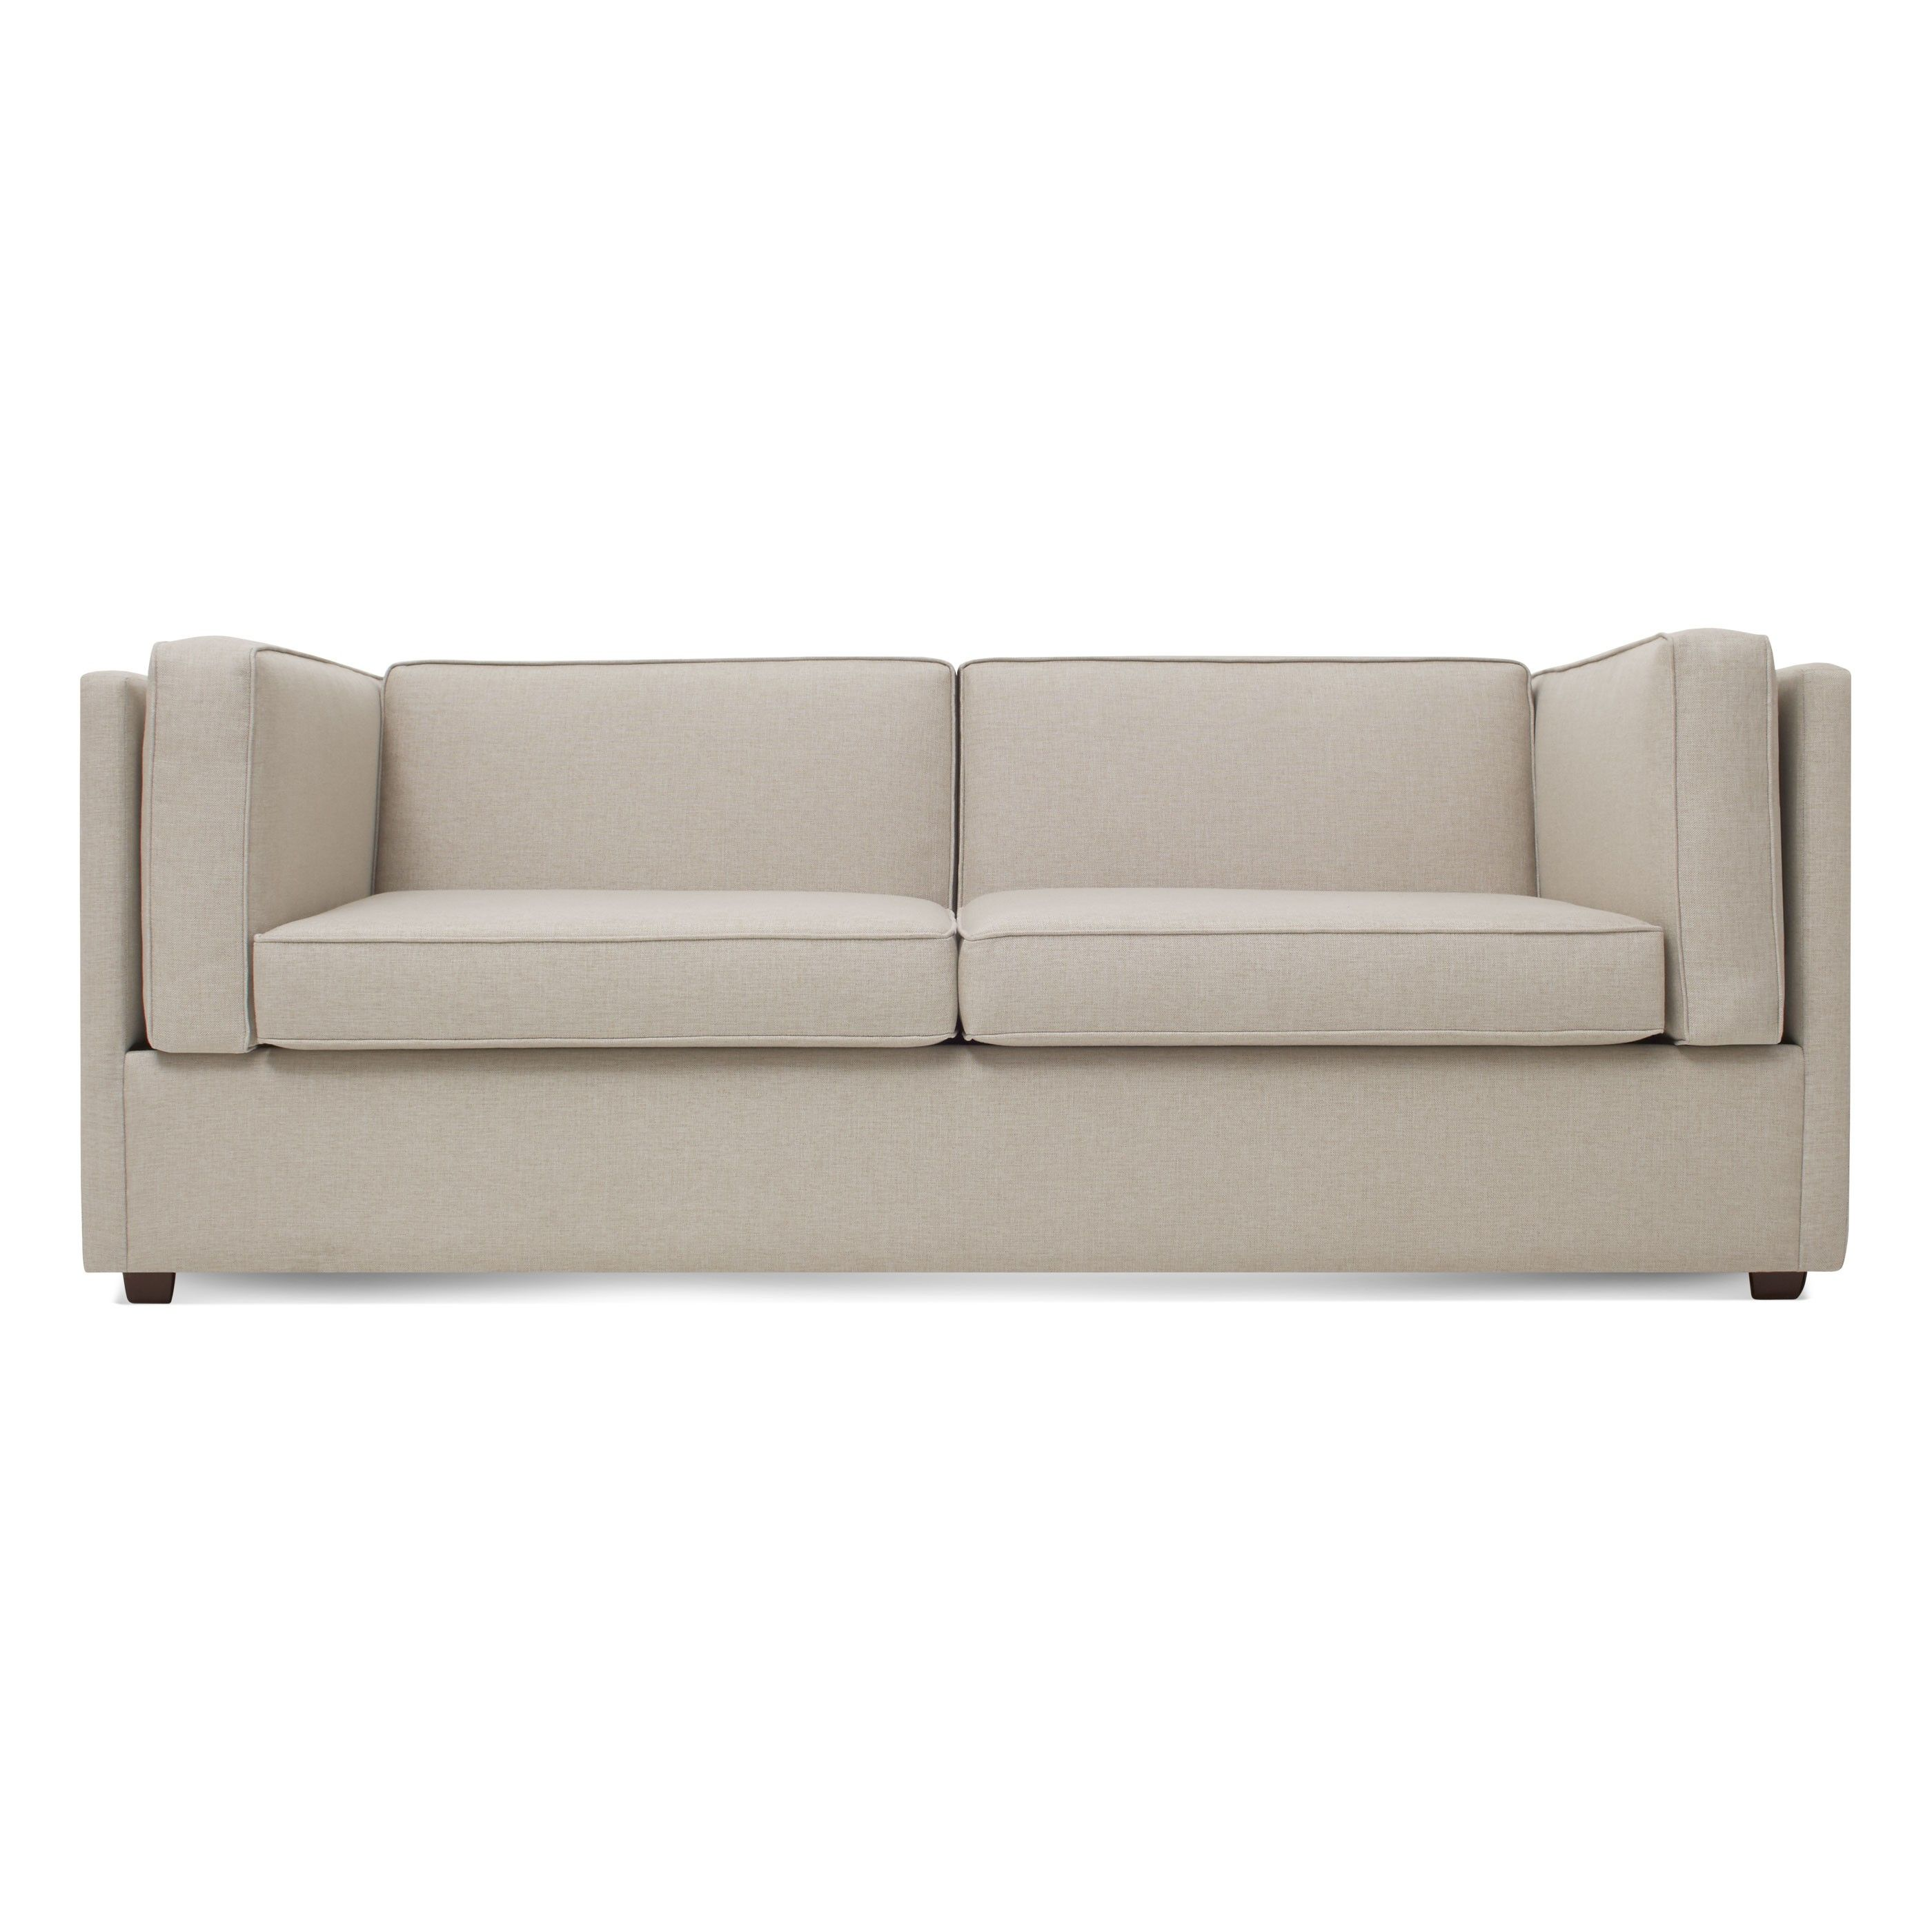 Tremendous Bank 80 Sleeper Sofa Home Ideas Sofa Sleeper Sofa Interior Design Ideas Clesiryabchikinfo